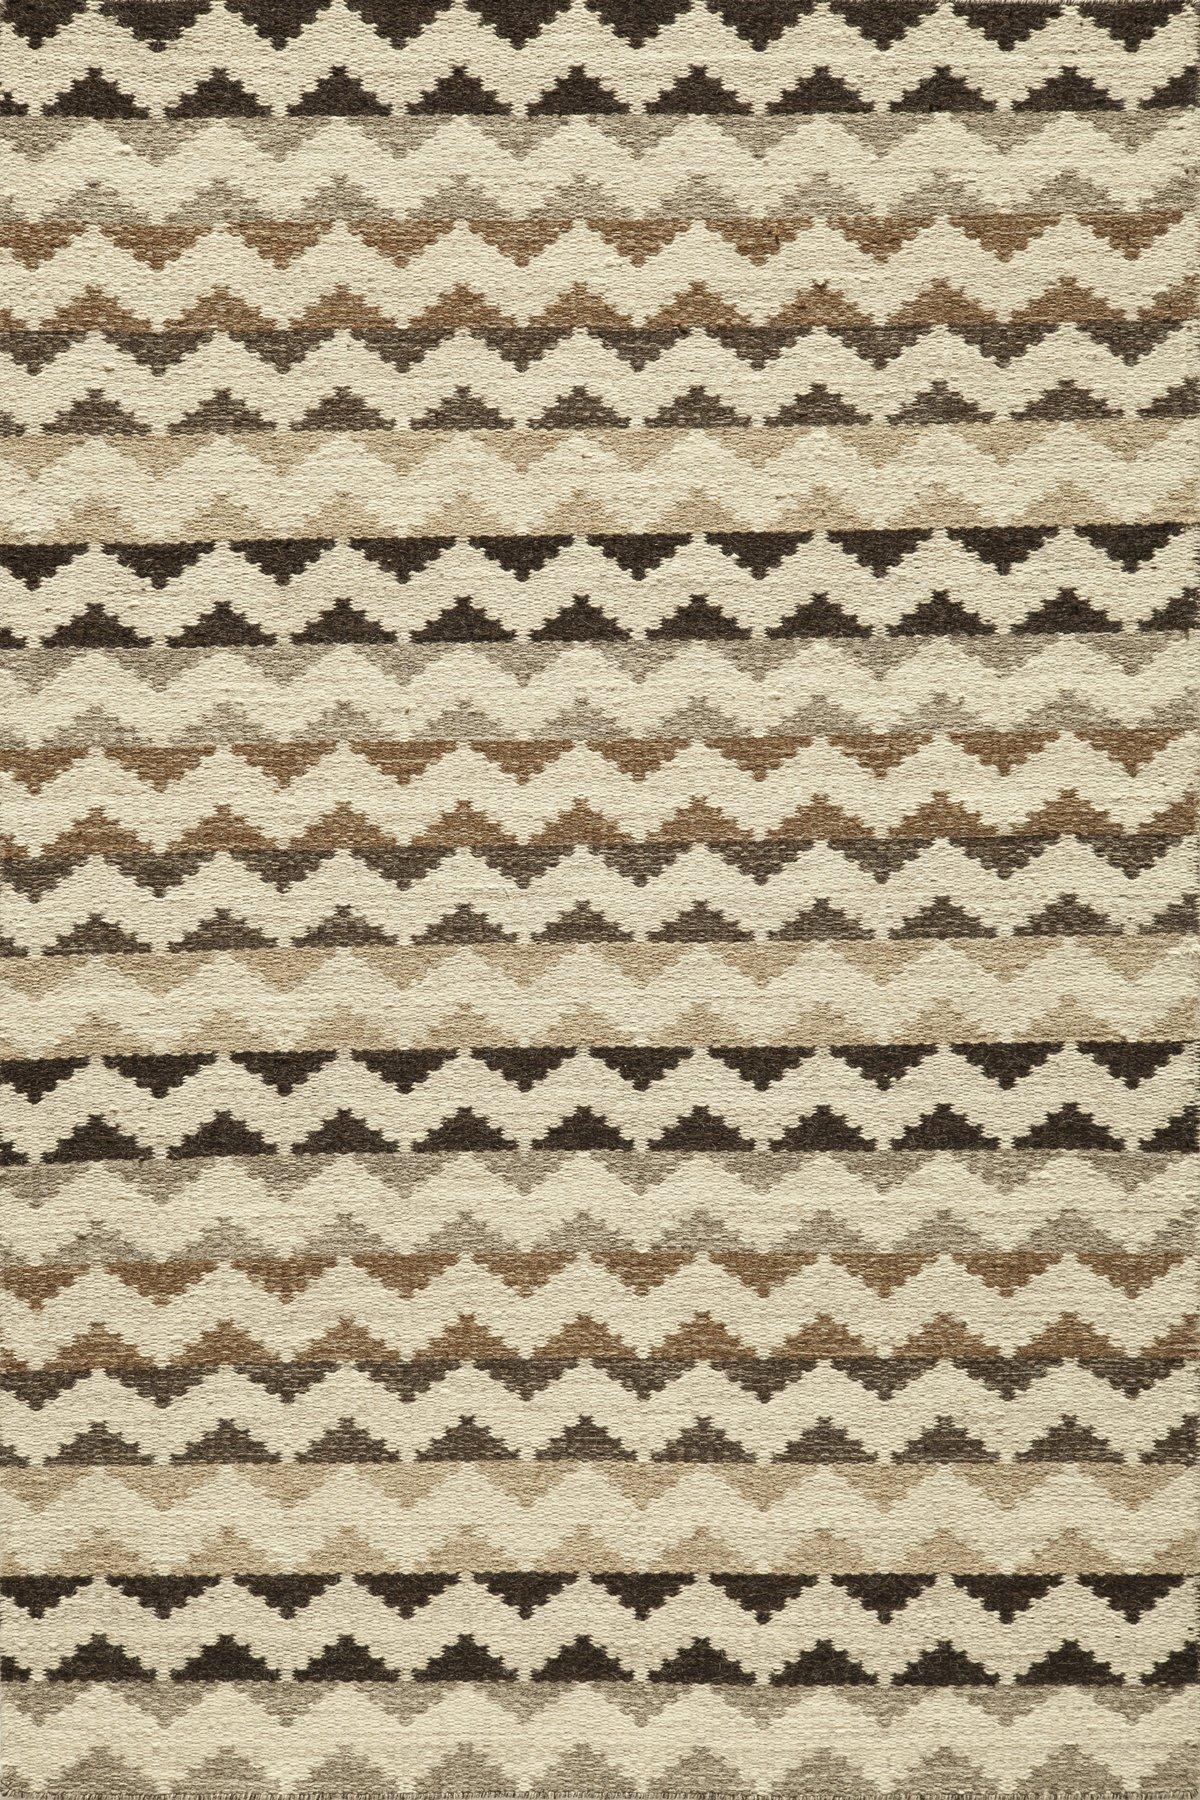 Momeni Rugs MESA0MES-5NAT5080 Mesa Collection, 100% Wool Hand Woven Flatweave Transitional Area Rug, 5' x 8', Natural Brown